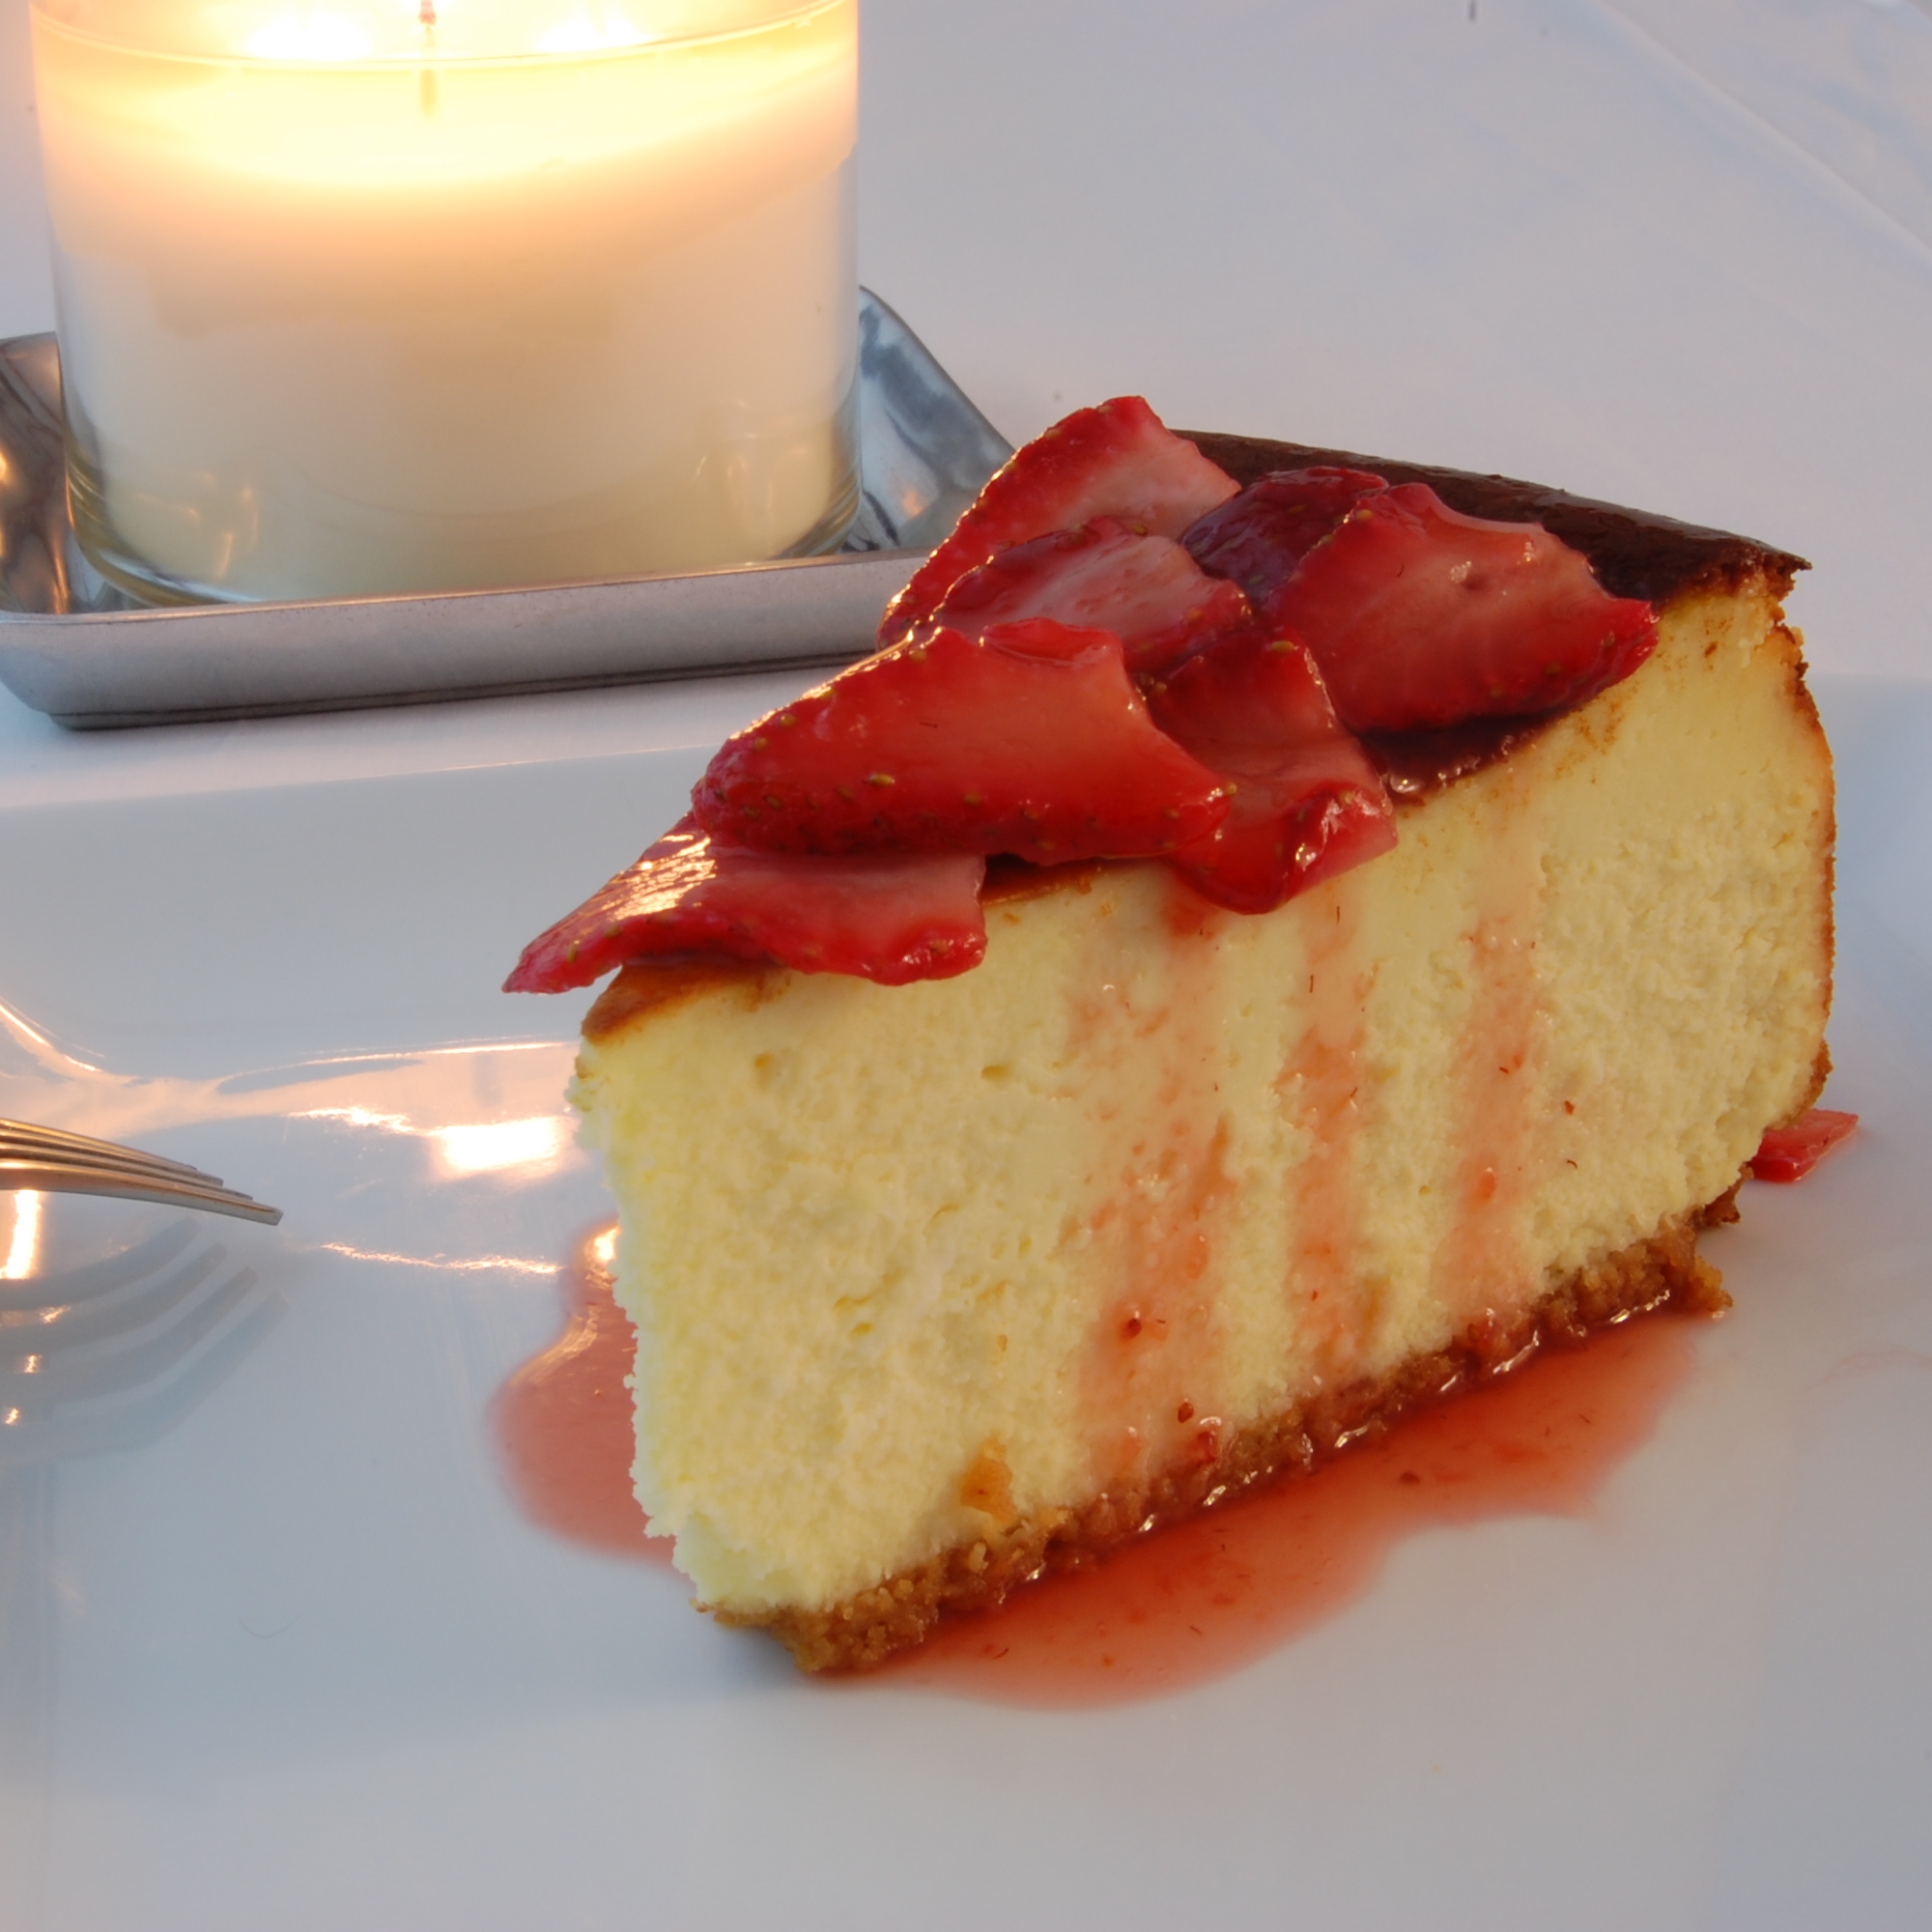 Recipes For Ny Cheesecake: New York Style Cheesecake